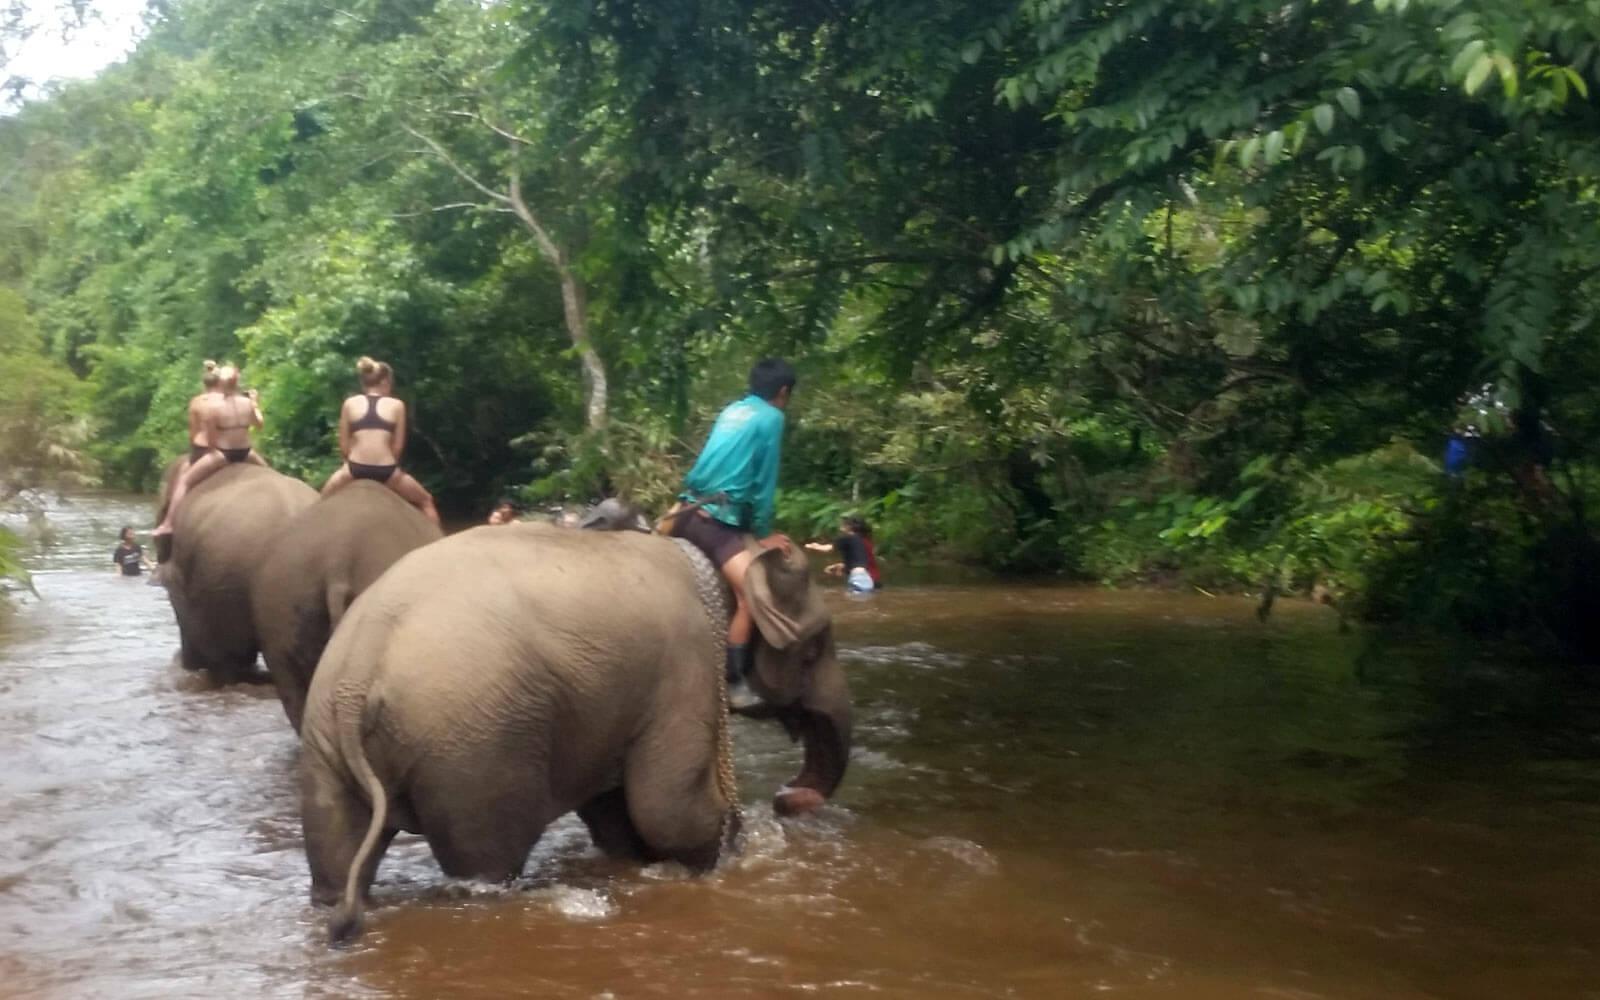 Elefanten baden im Fluss Thailand